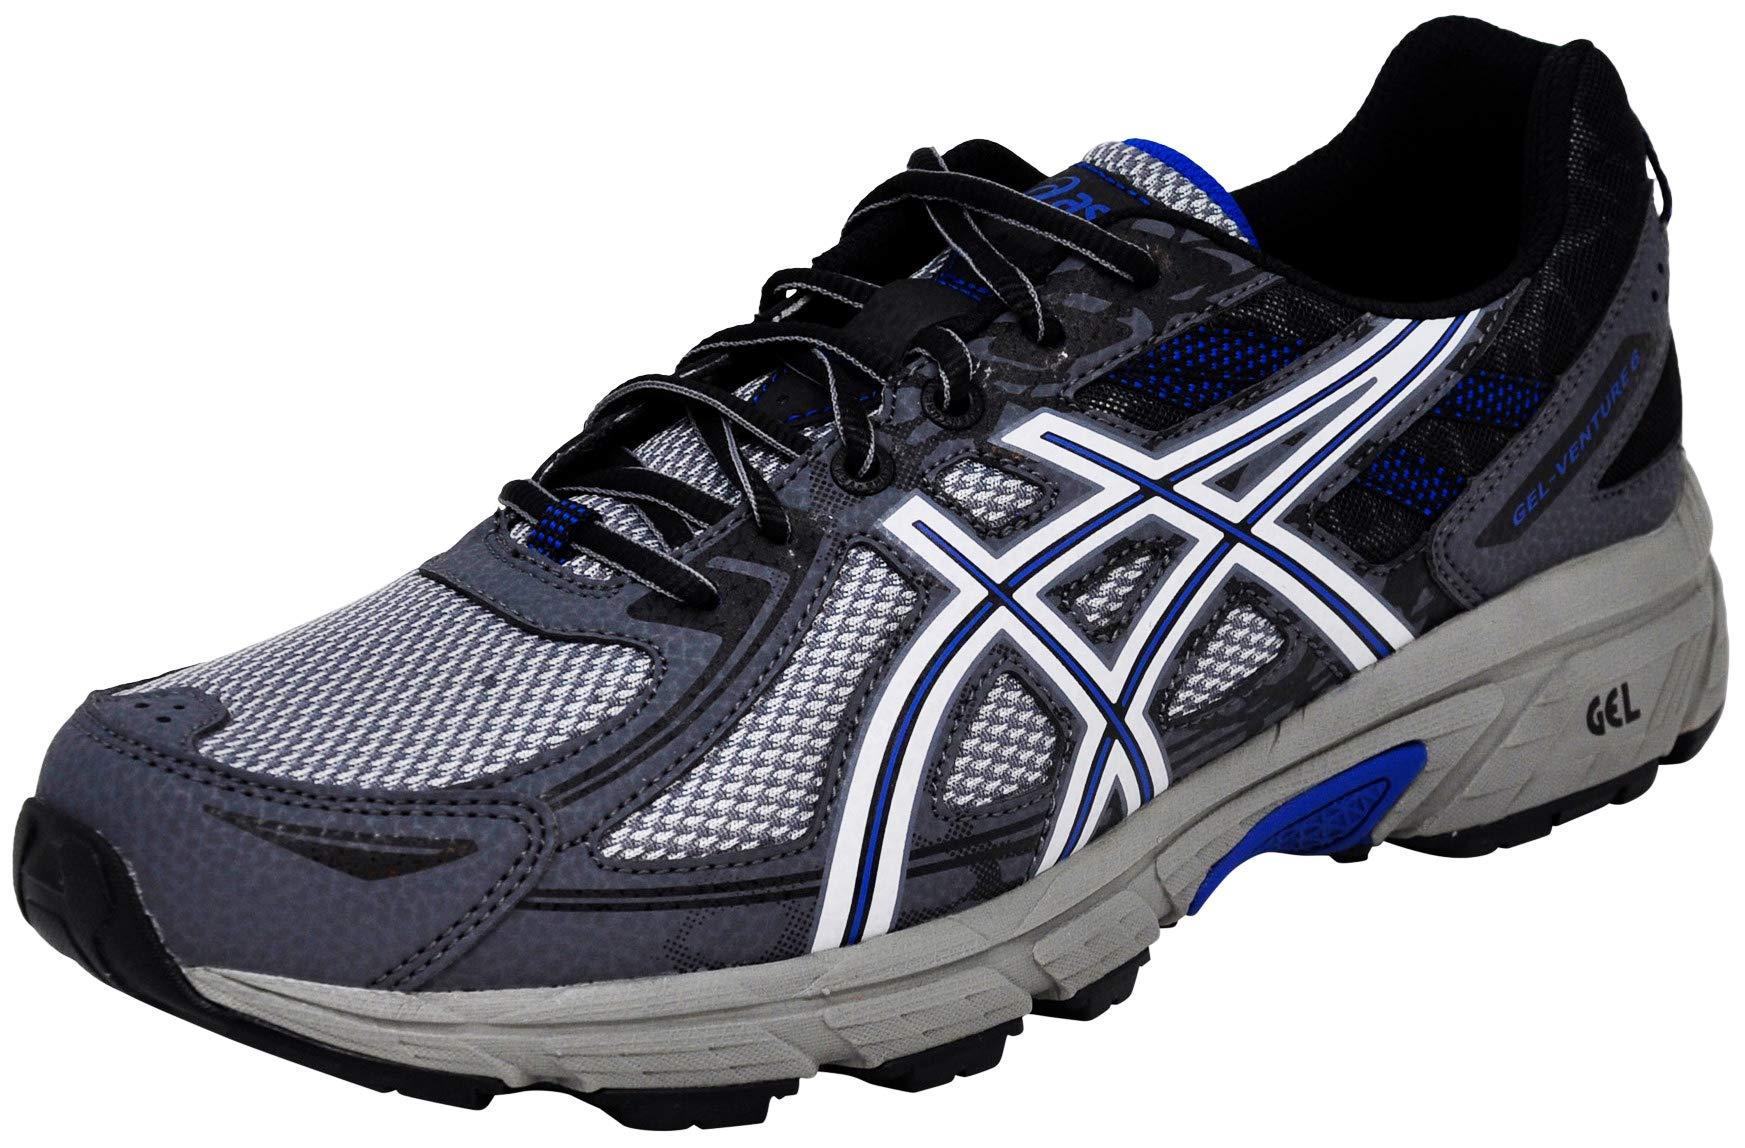 ASICS Men Gel-Venture 6 Running Shoe, Graphite Grey Black, 8.5 M US by ASICS